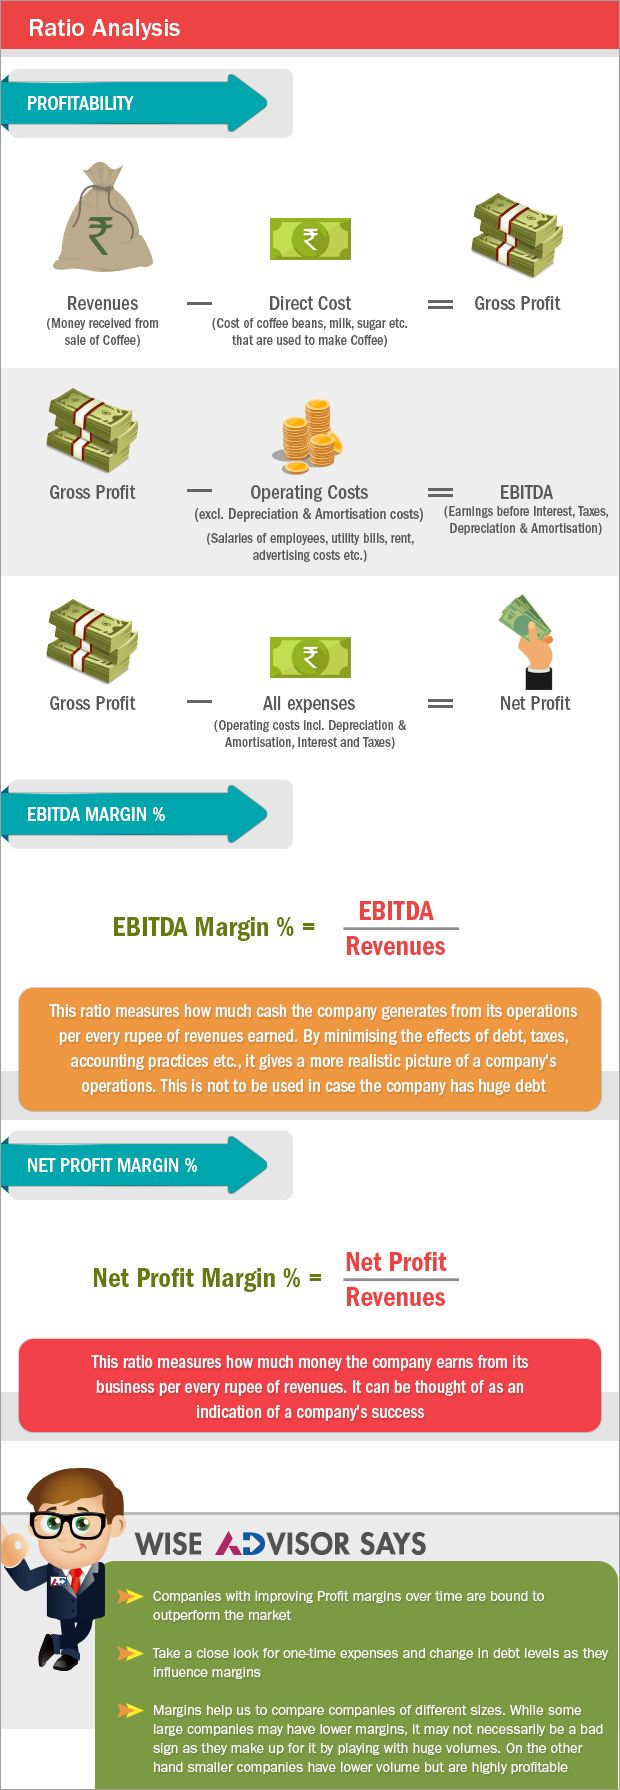 Profitability Ratios These Ratios Measure How Efficiently A